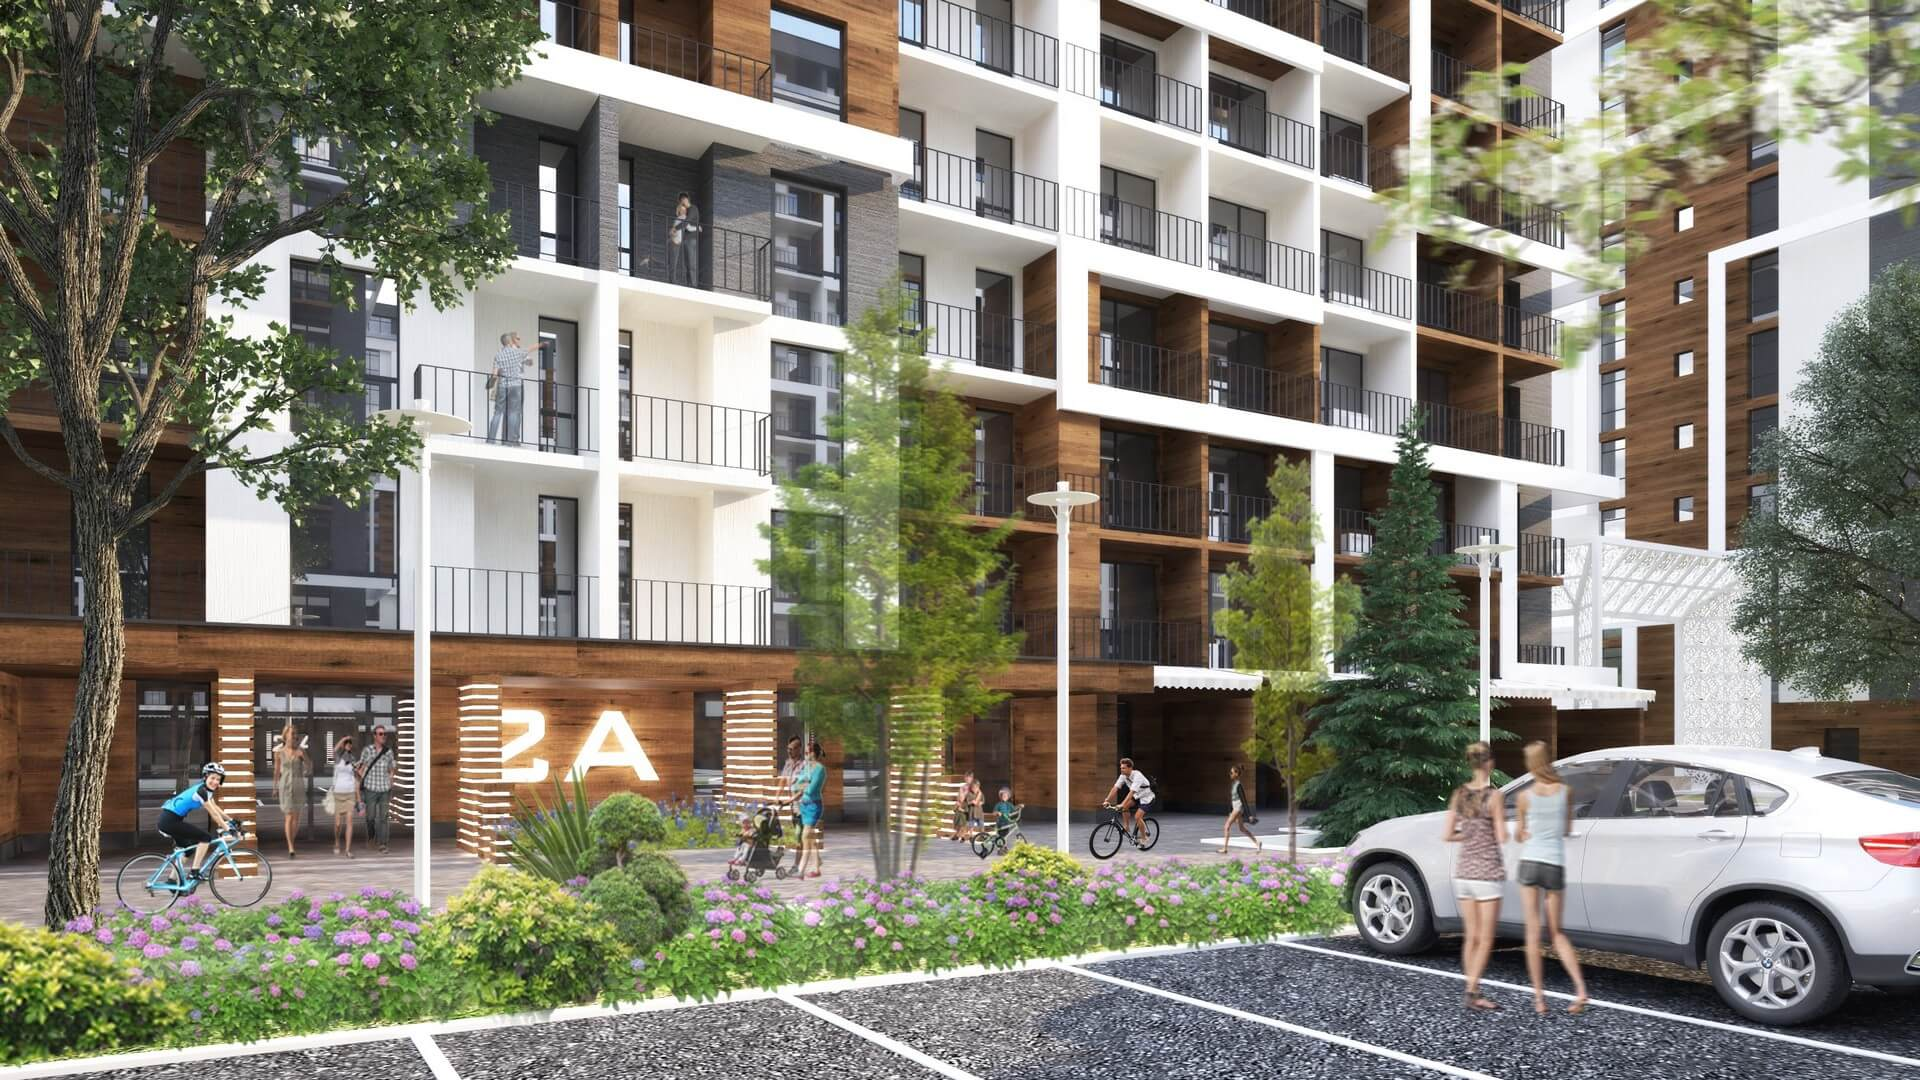 Апартаменты в новом комплексе в Дагомысе - image Apartamenty-na-beregu-s-samoj-chistoj-vodoj on https://bizneskvartal.ru